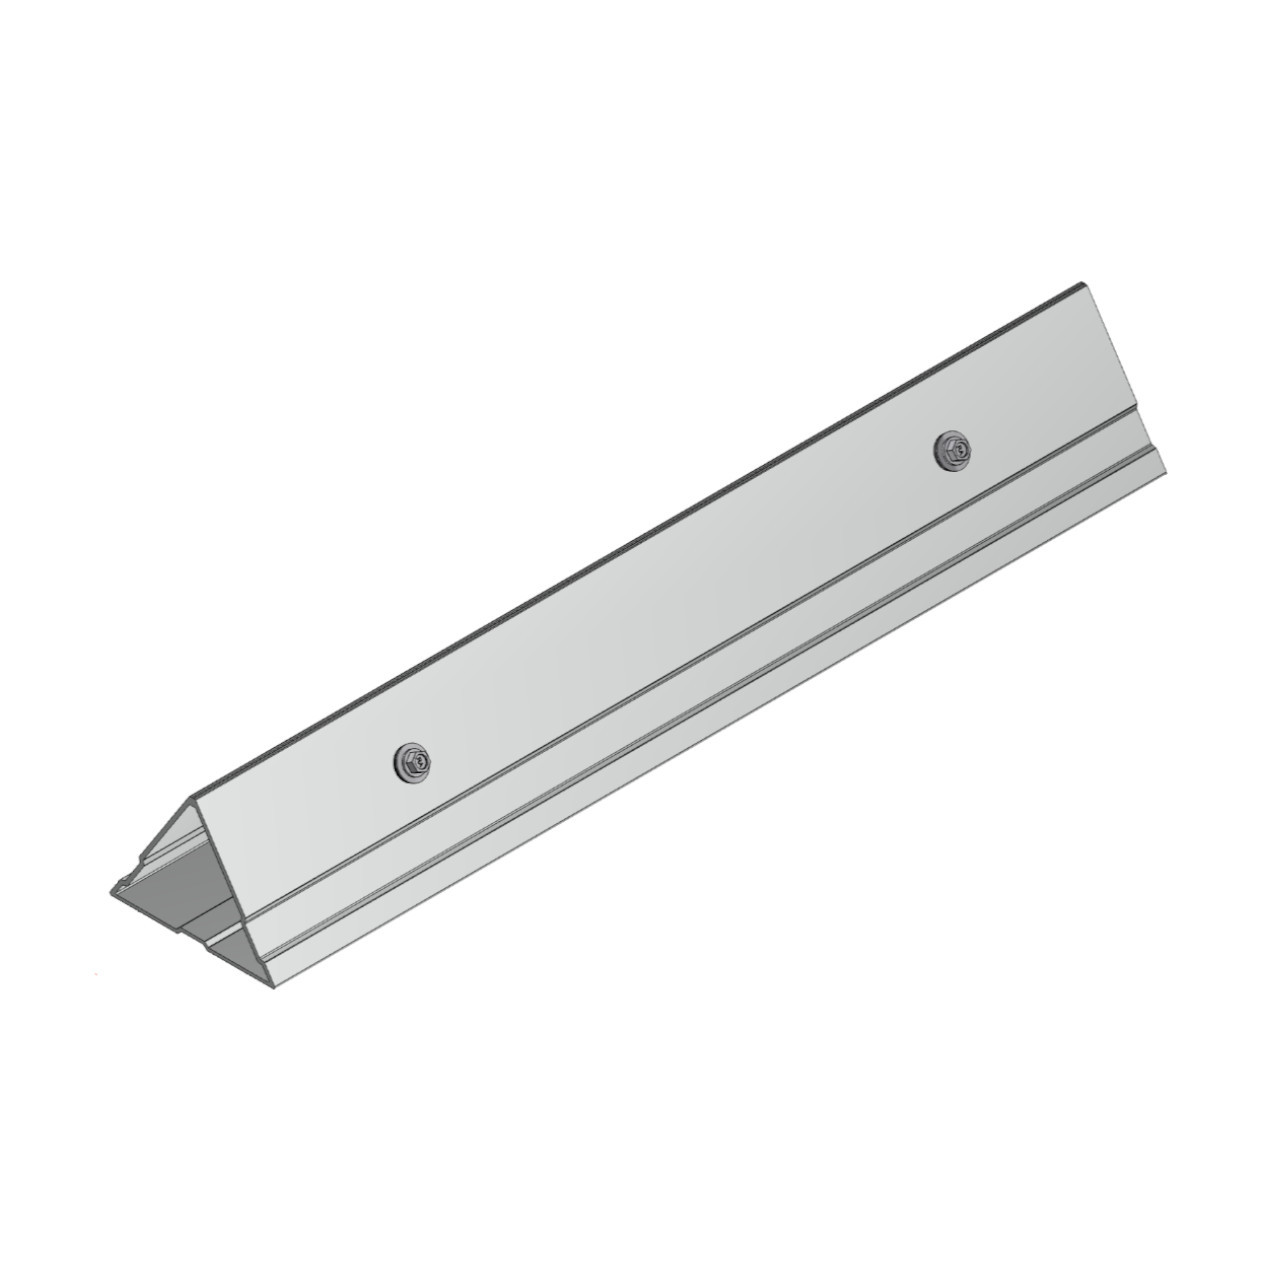 Schletter - S1.8 Splice Kit - With Screws